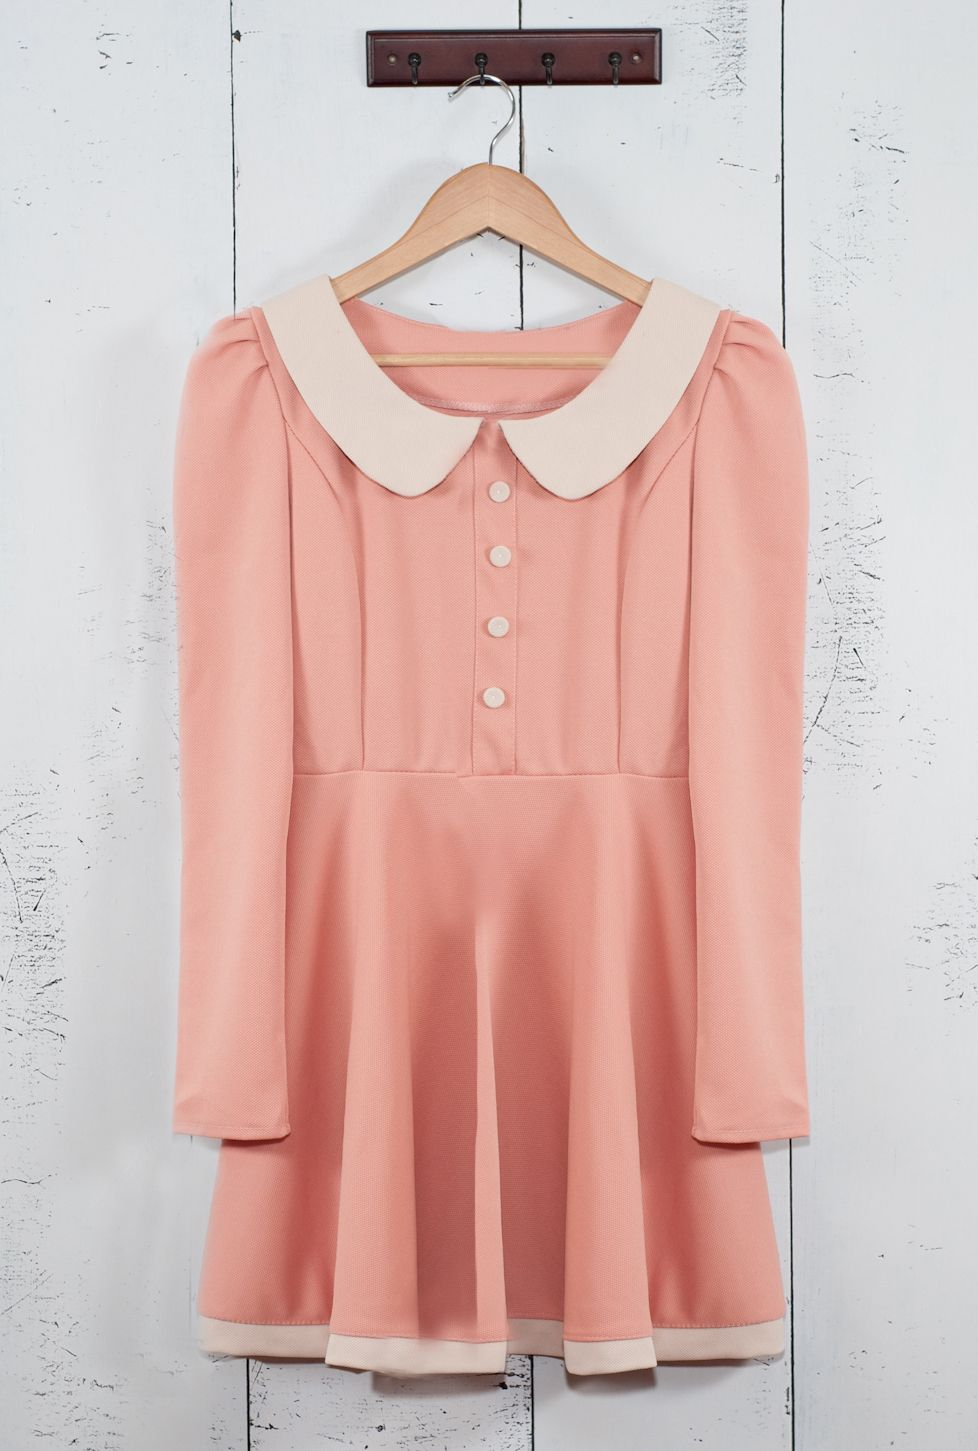 20++ Pink dress peter pan collar information